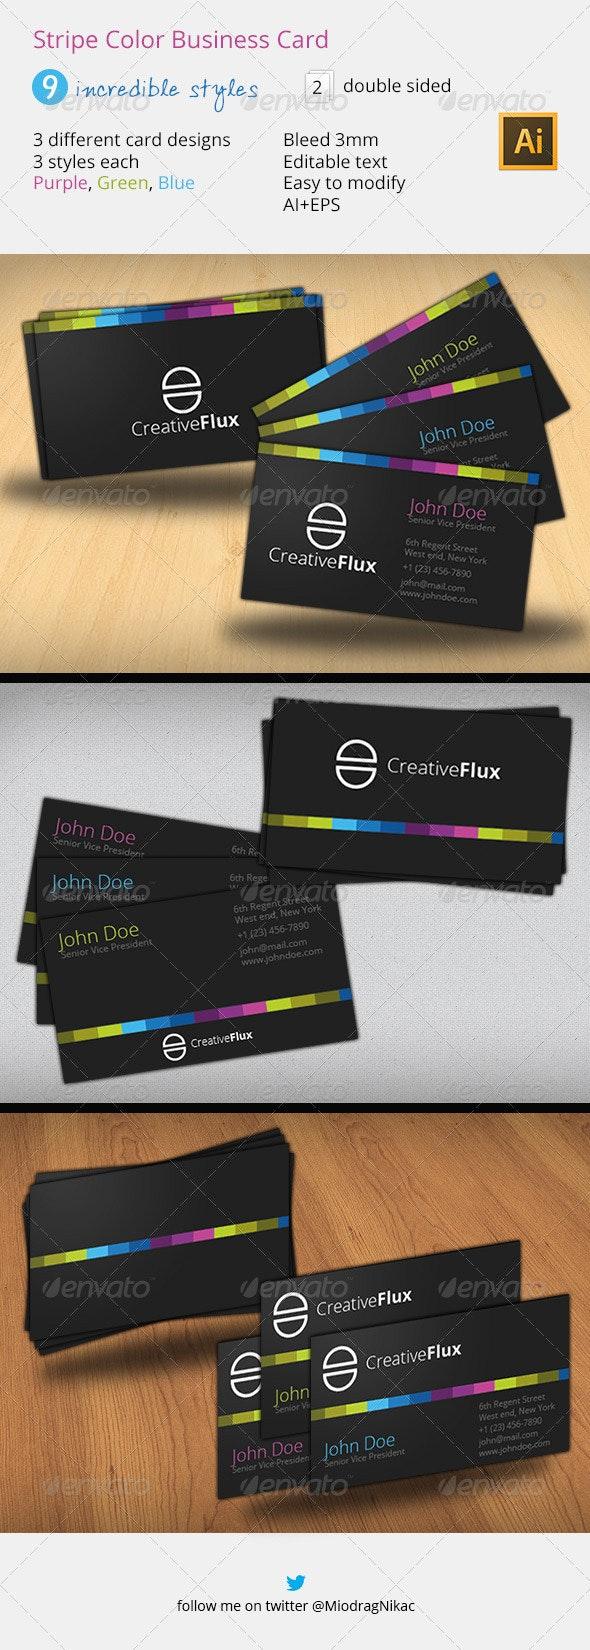 Stripe Color Business Card - Creative Business Cards